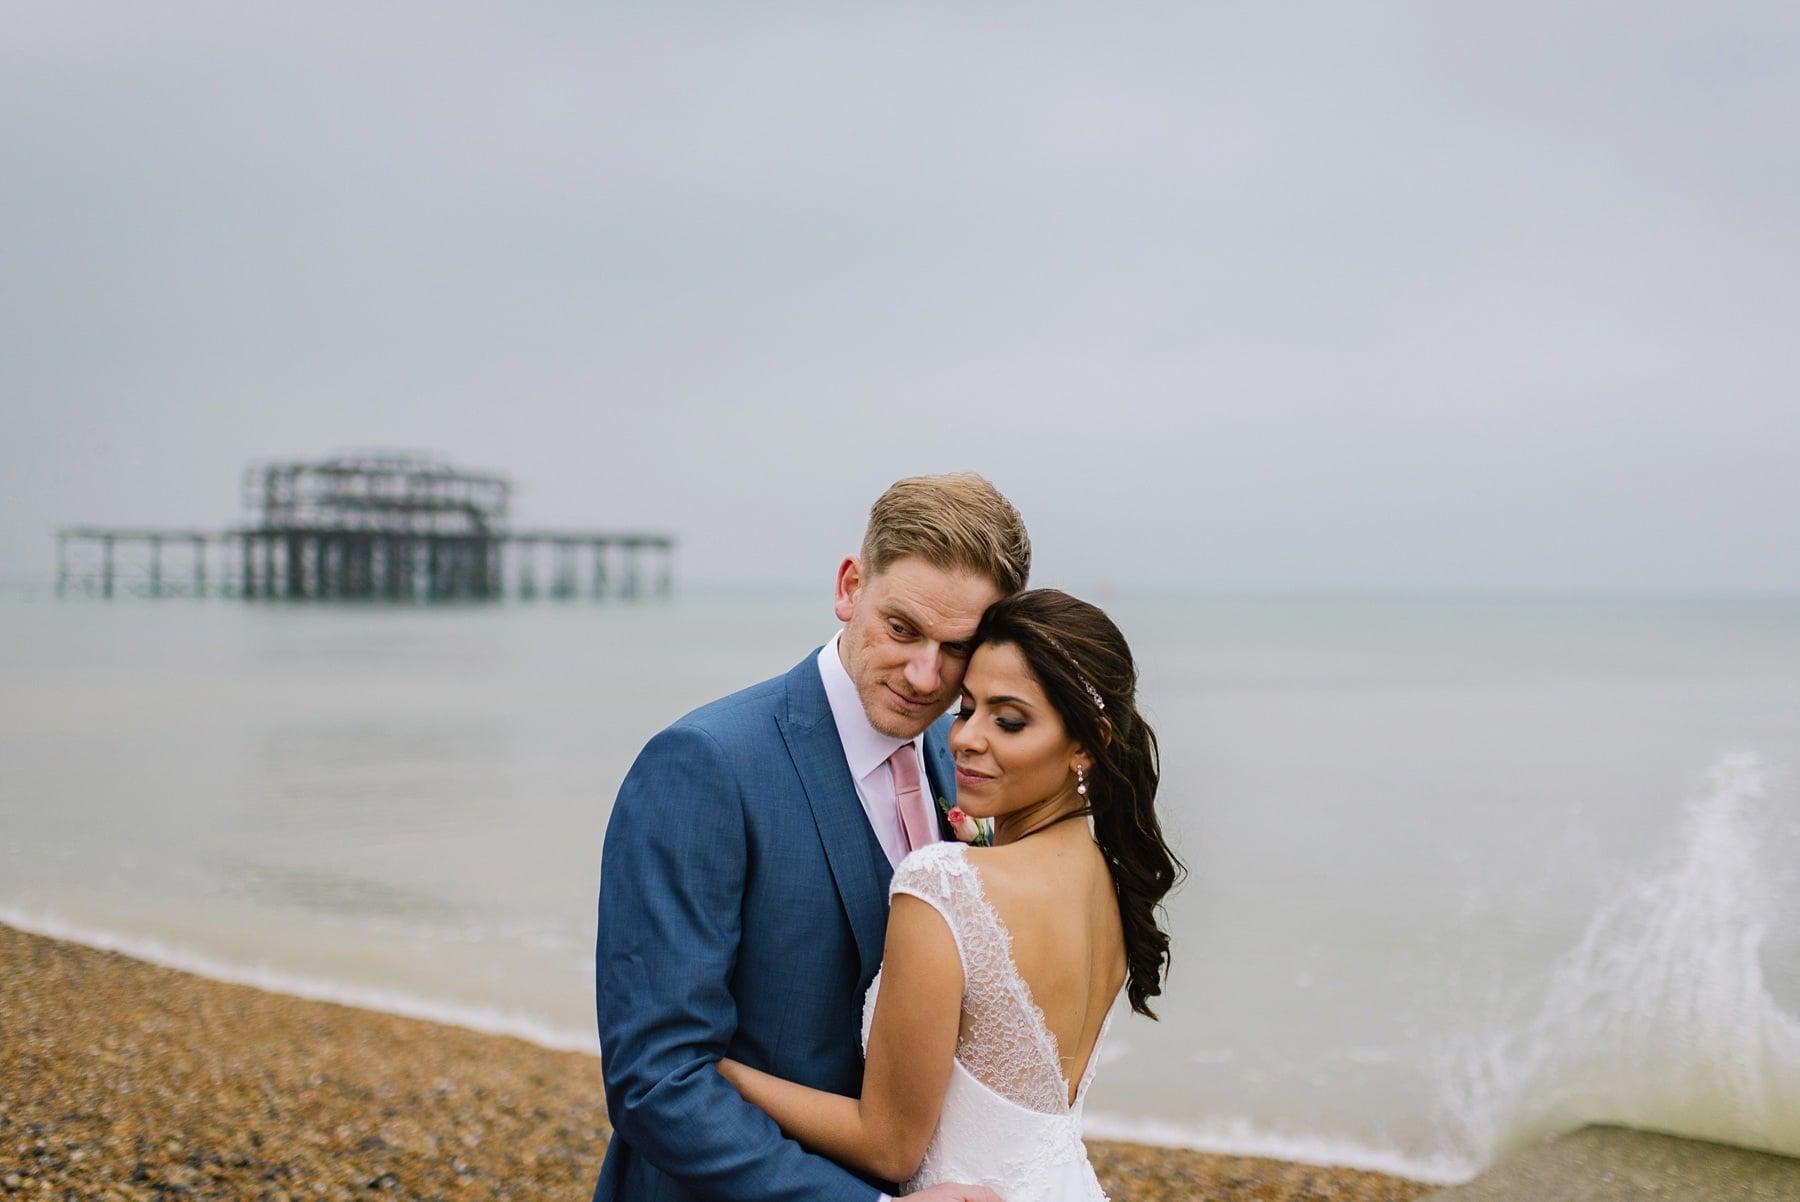 Brighton Wedding, alternative wedding photographer brighton